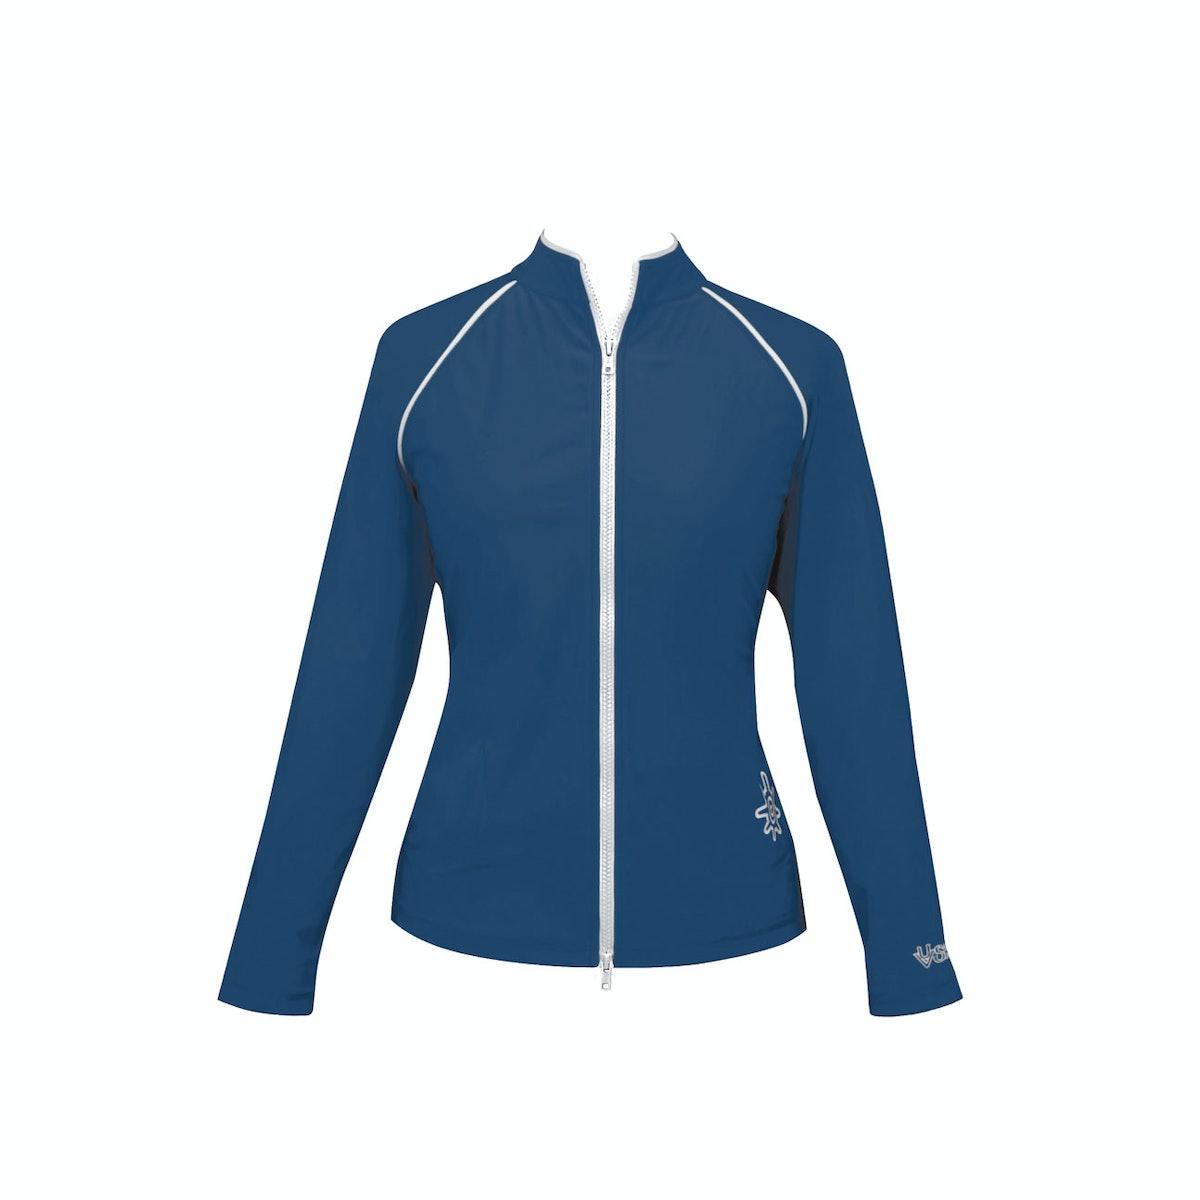 UVSkinz Water Jacket